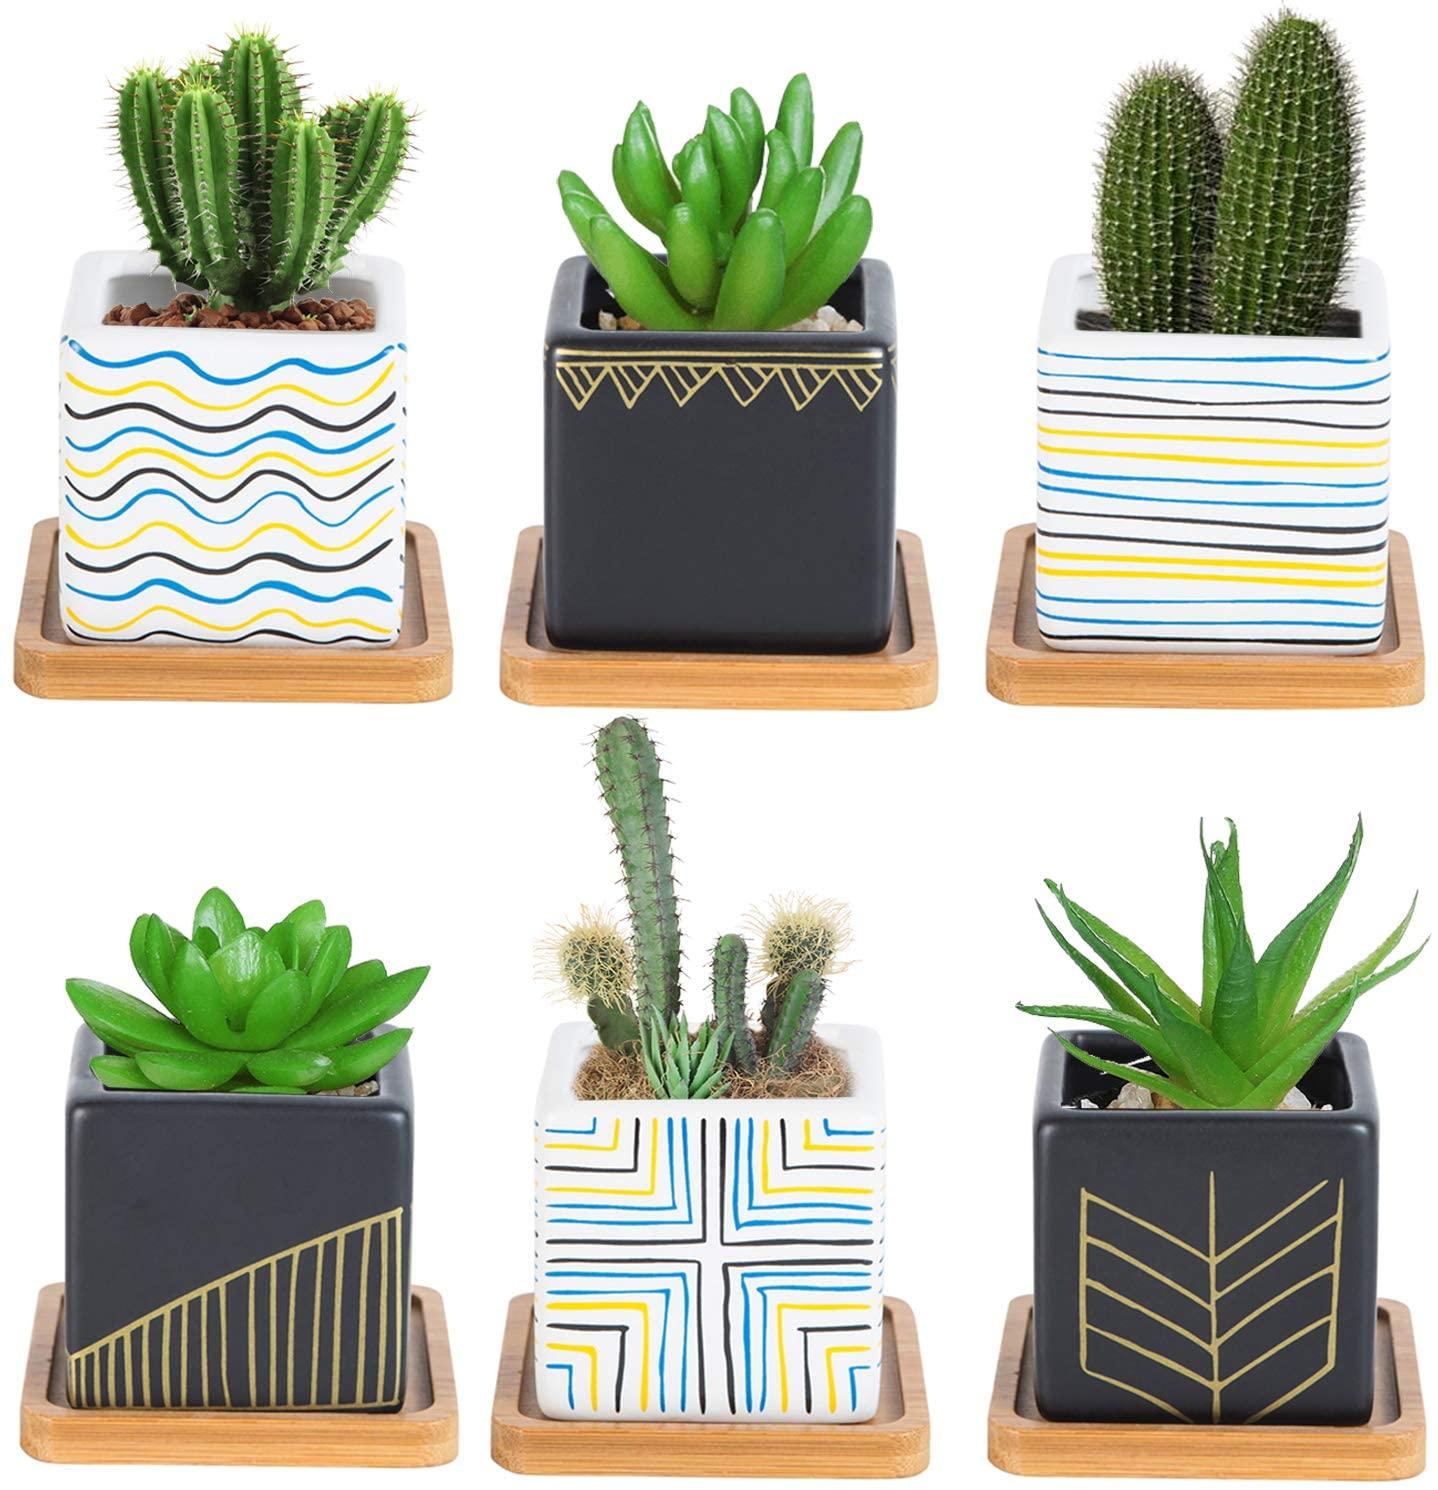 Homiea Set of 6 Mini Succulent Planters - Tiny Succulent Pots for Home - Mini Planter and Cute Plant Pots for Succulents - Small Plant Containers for Succulents, Cactus, and Flowers